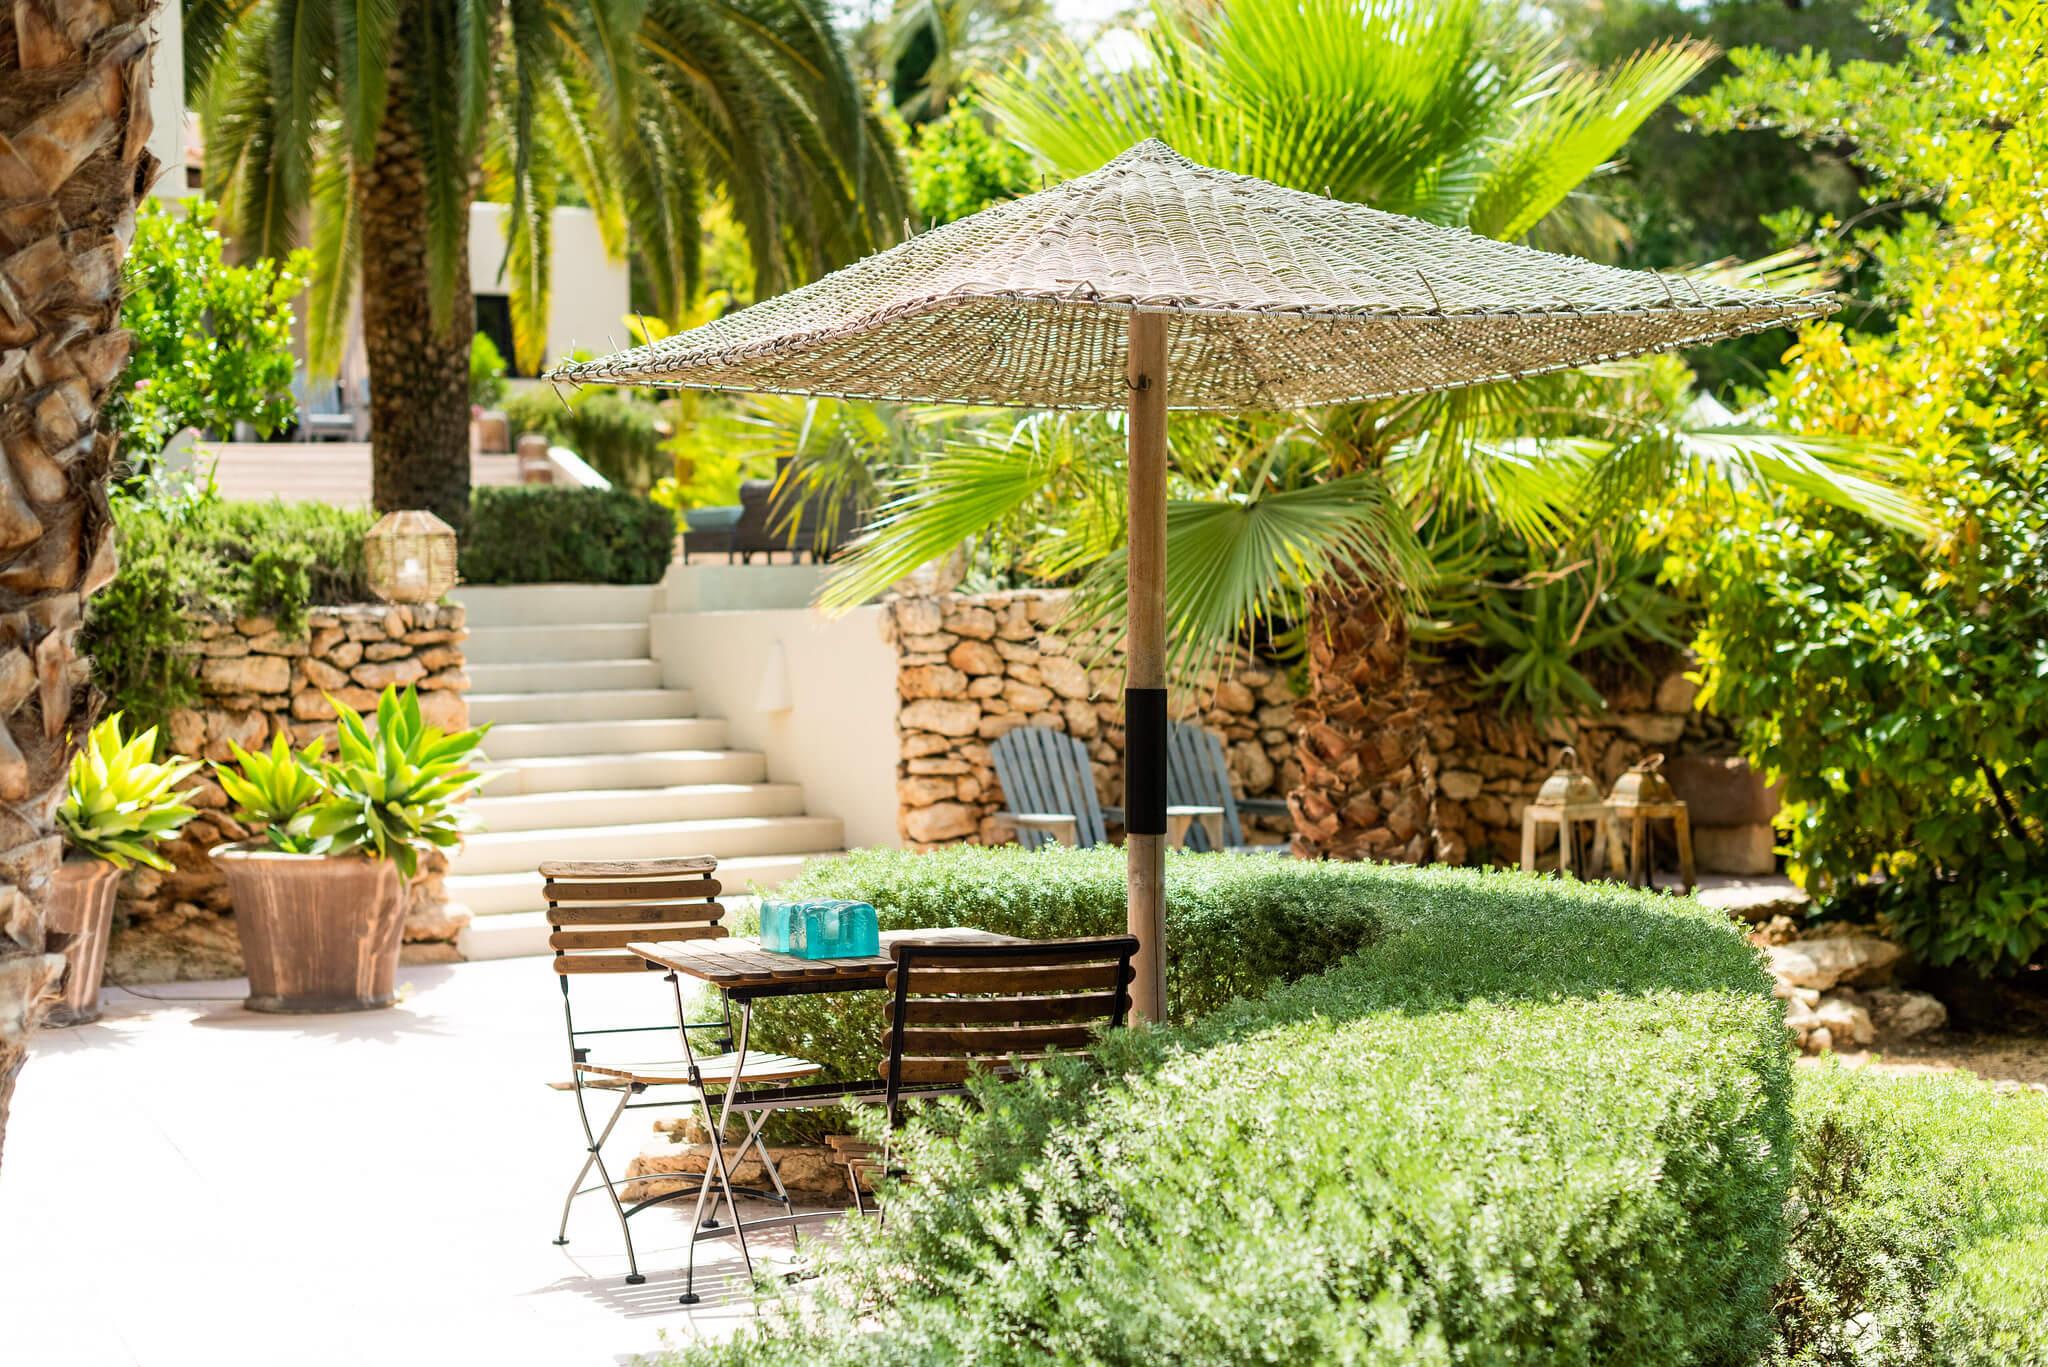 https://www.white-ibiza.com/wp-content/uploads/2020/05/white-ibiza-villas-can-riviere-exterior-small-table.jpg